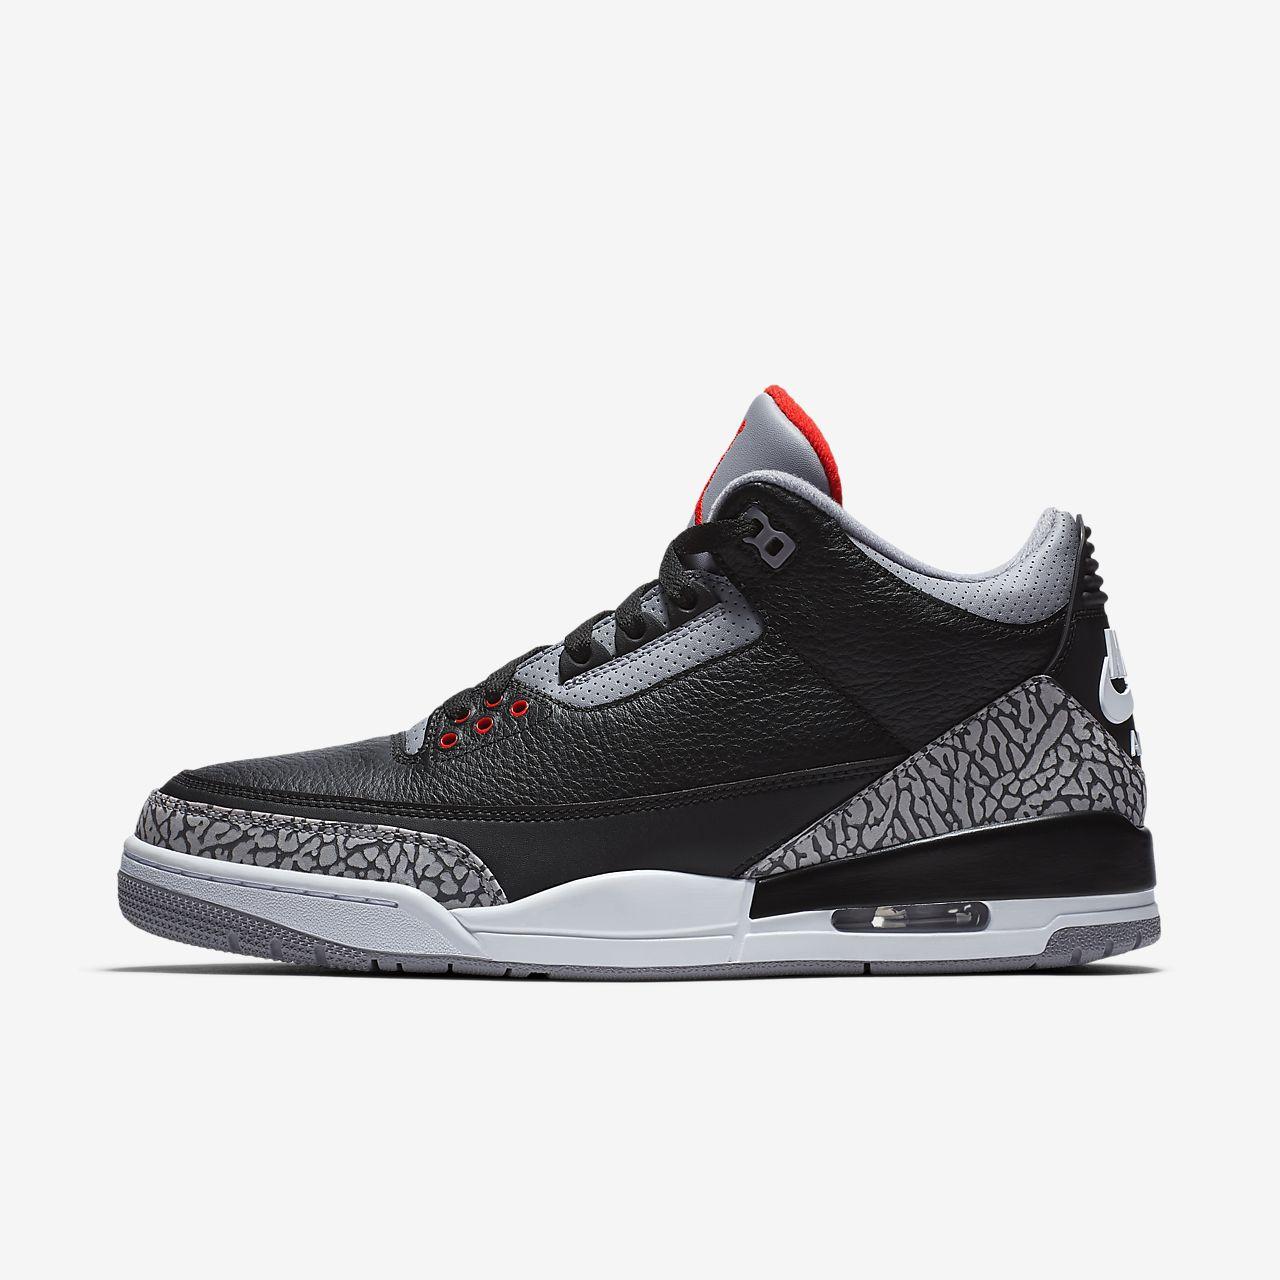 44d1c42745093 air jordan shoes price singapore